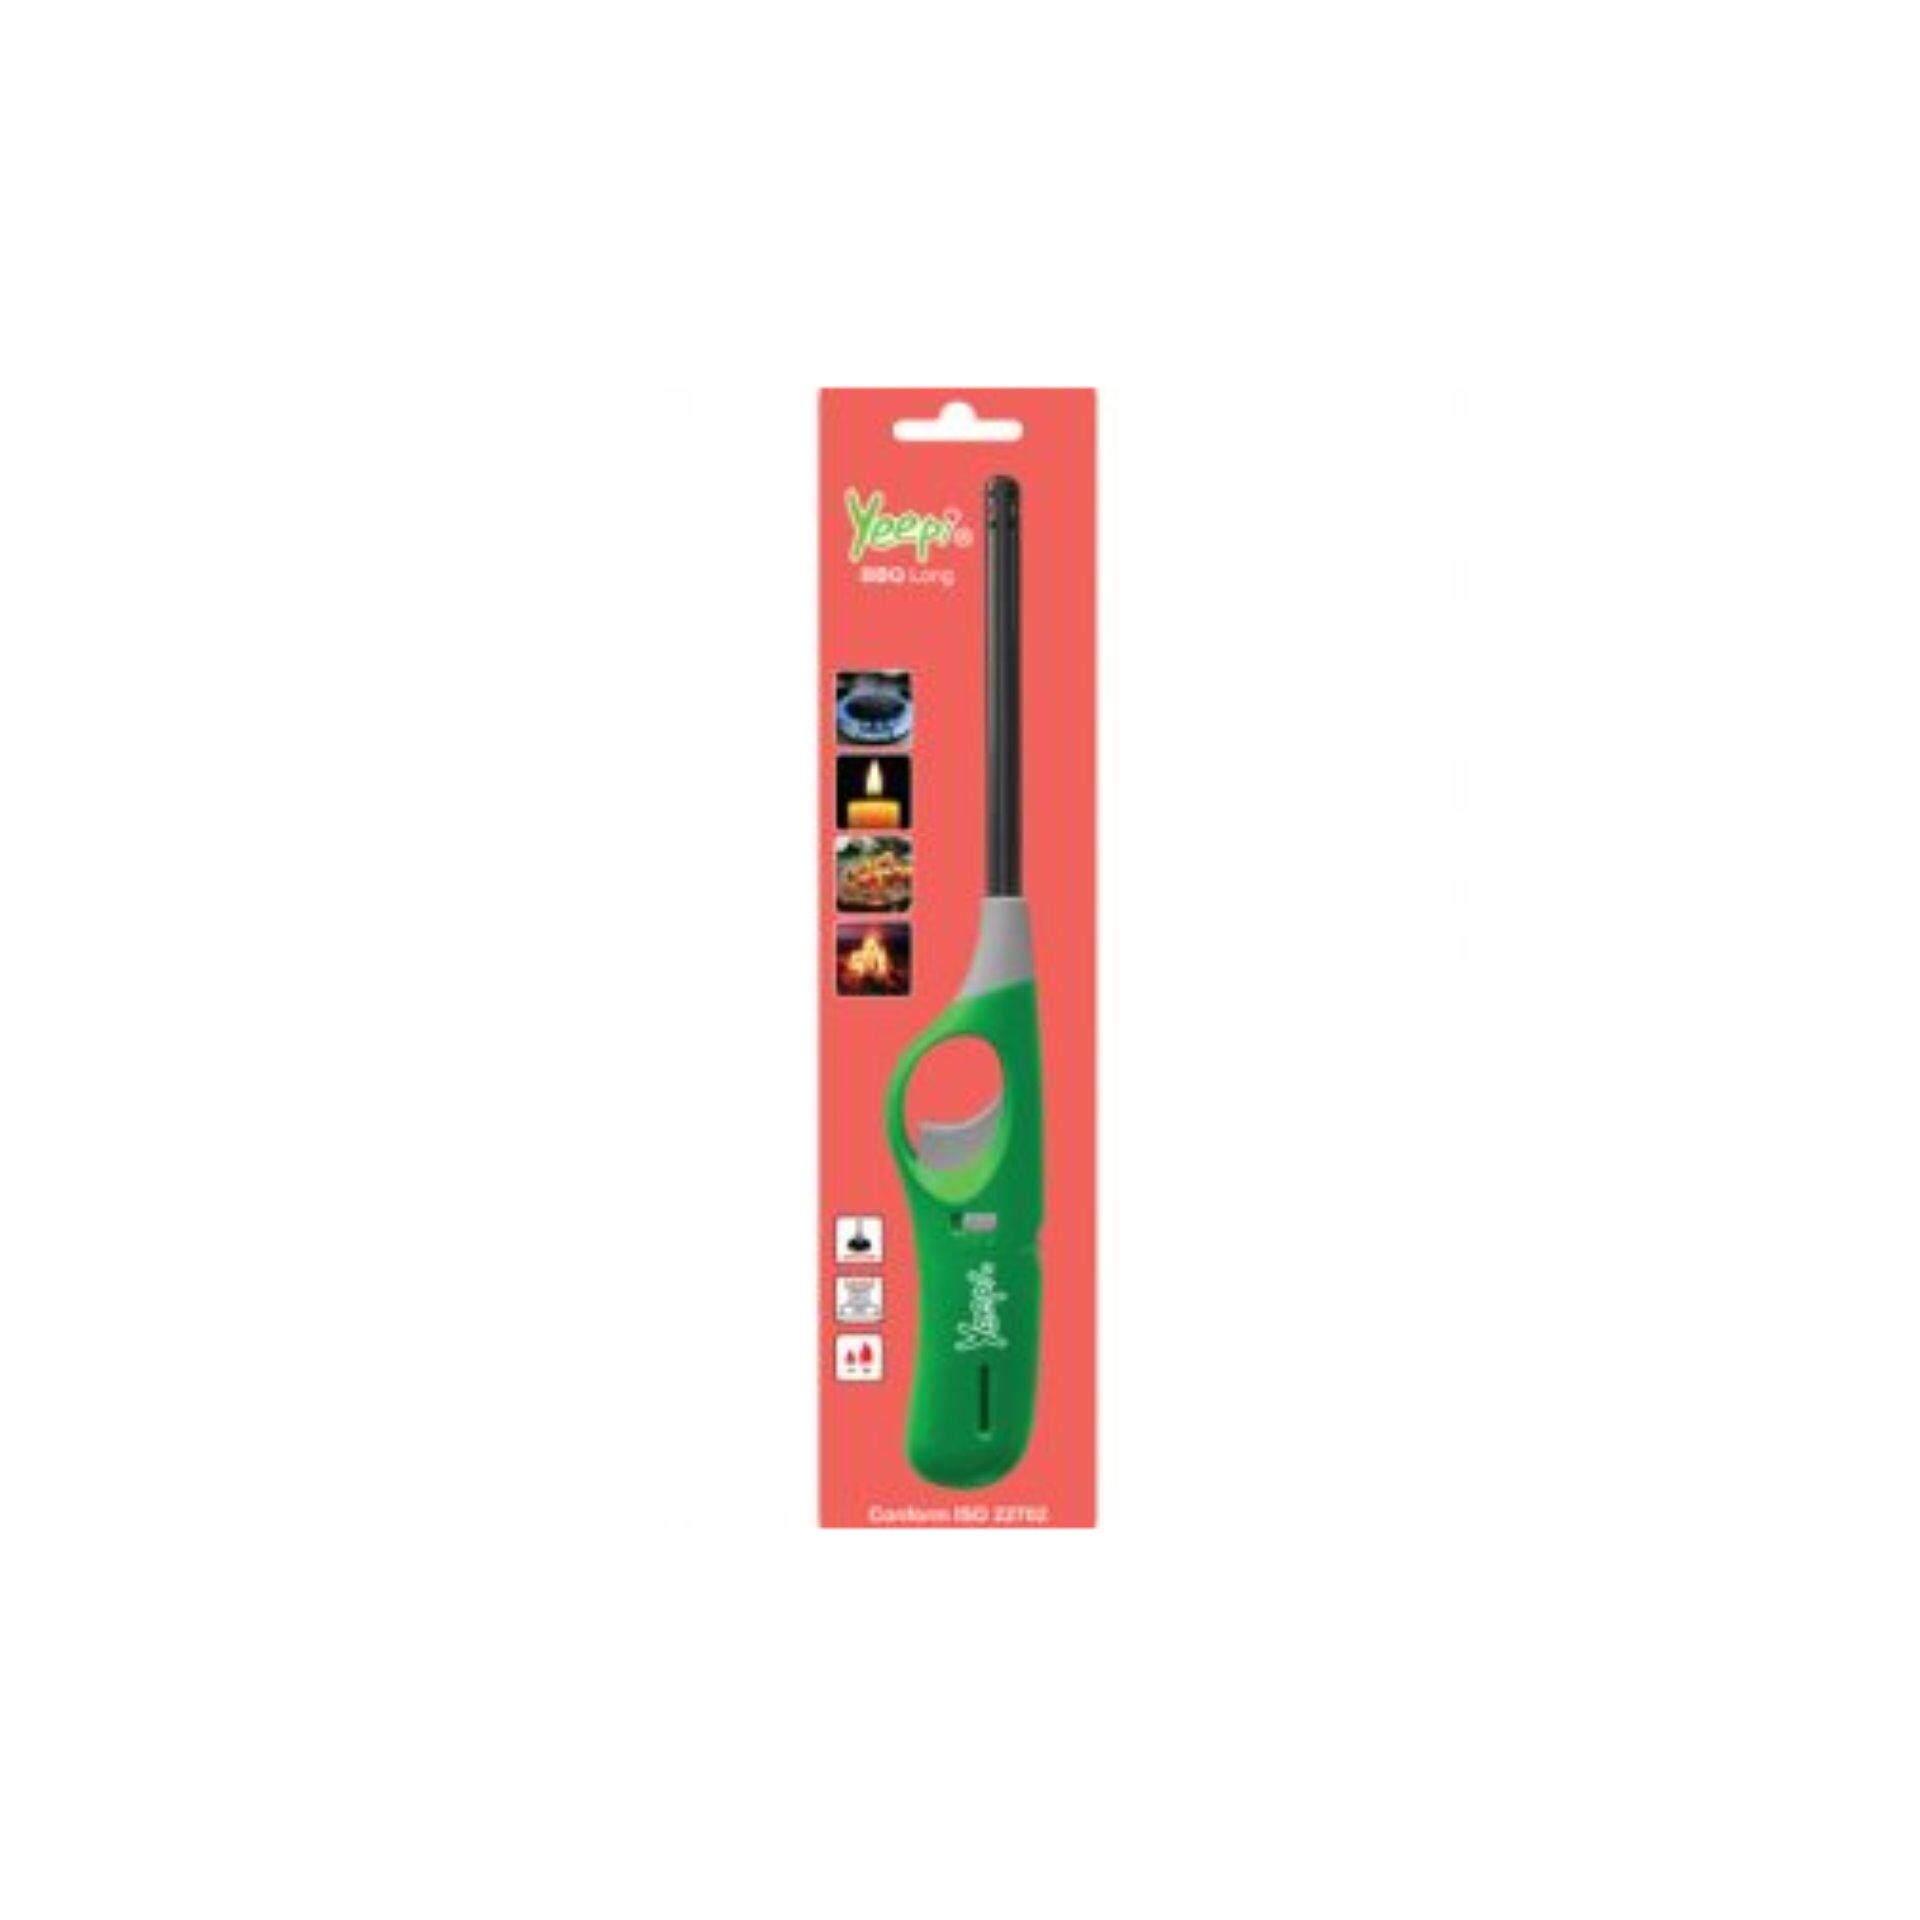 2pcs SIRIM ISO 9994 Yeepi BBQ Long Kitchen Lighter (Multicolour)